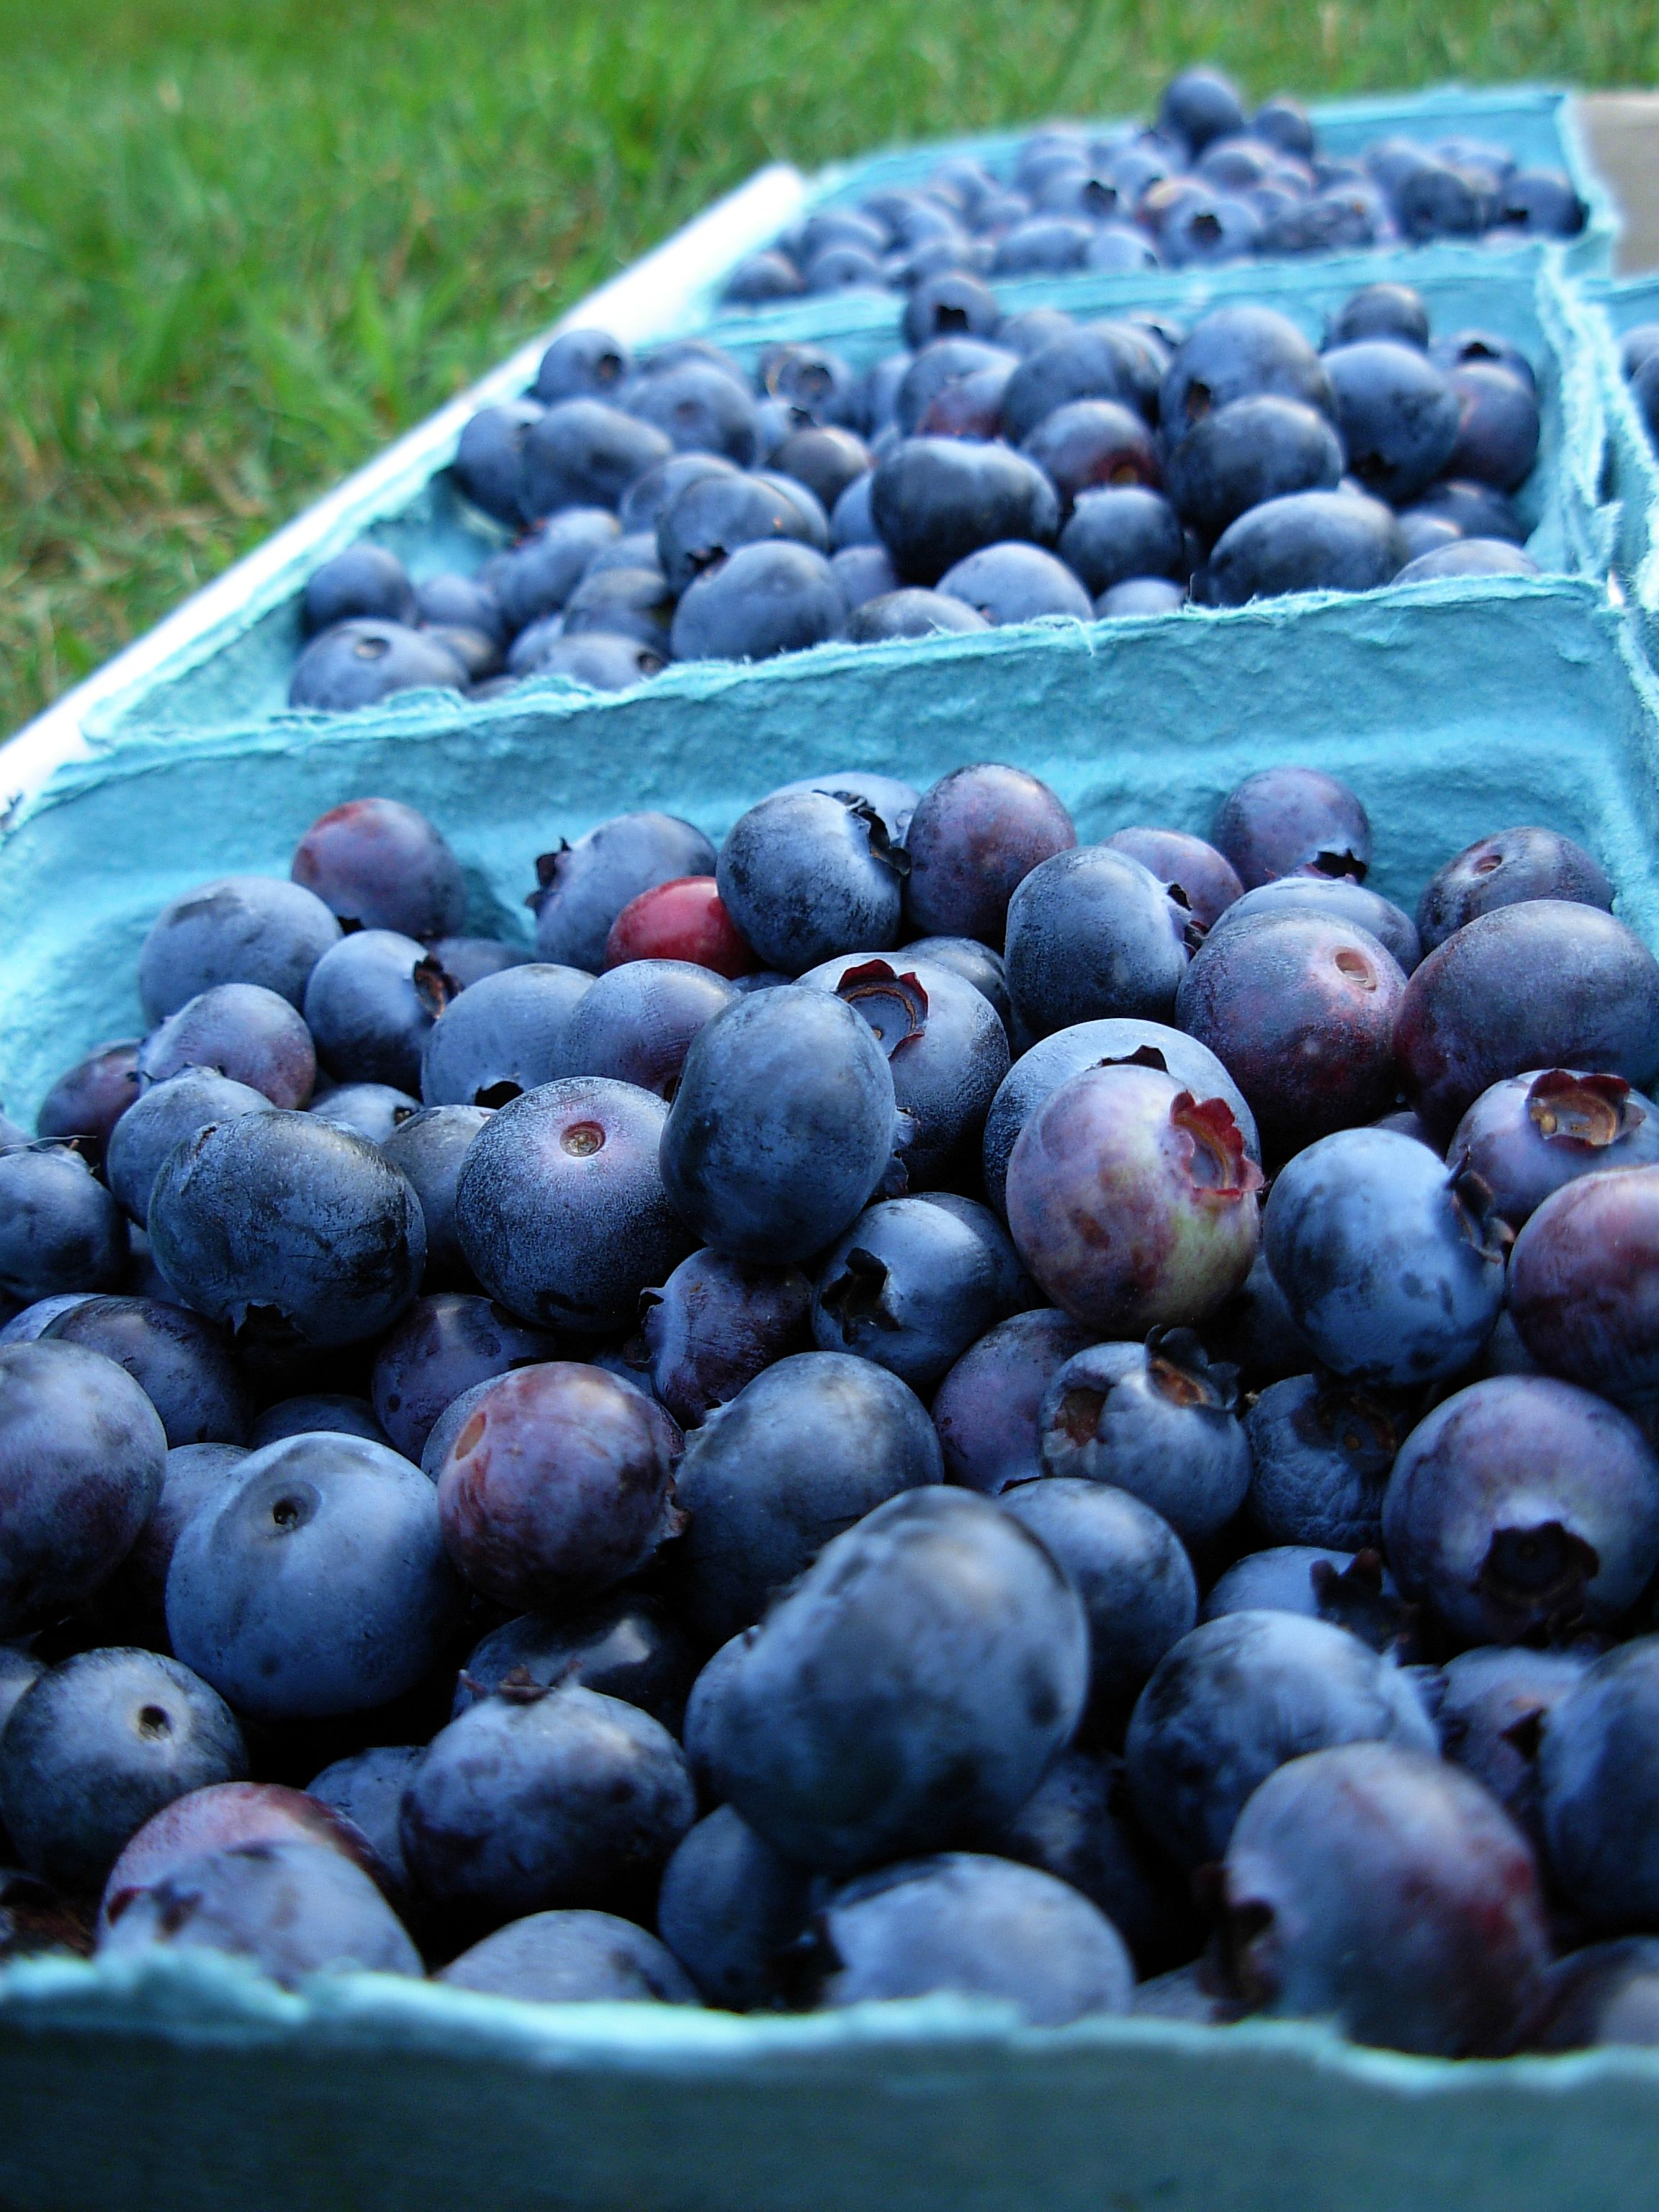 2009-AUG25-Blueberries